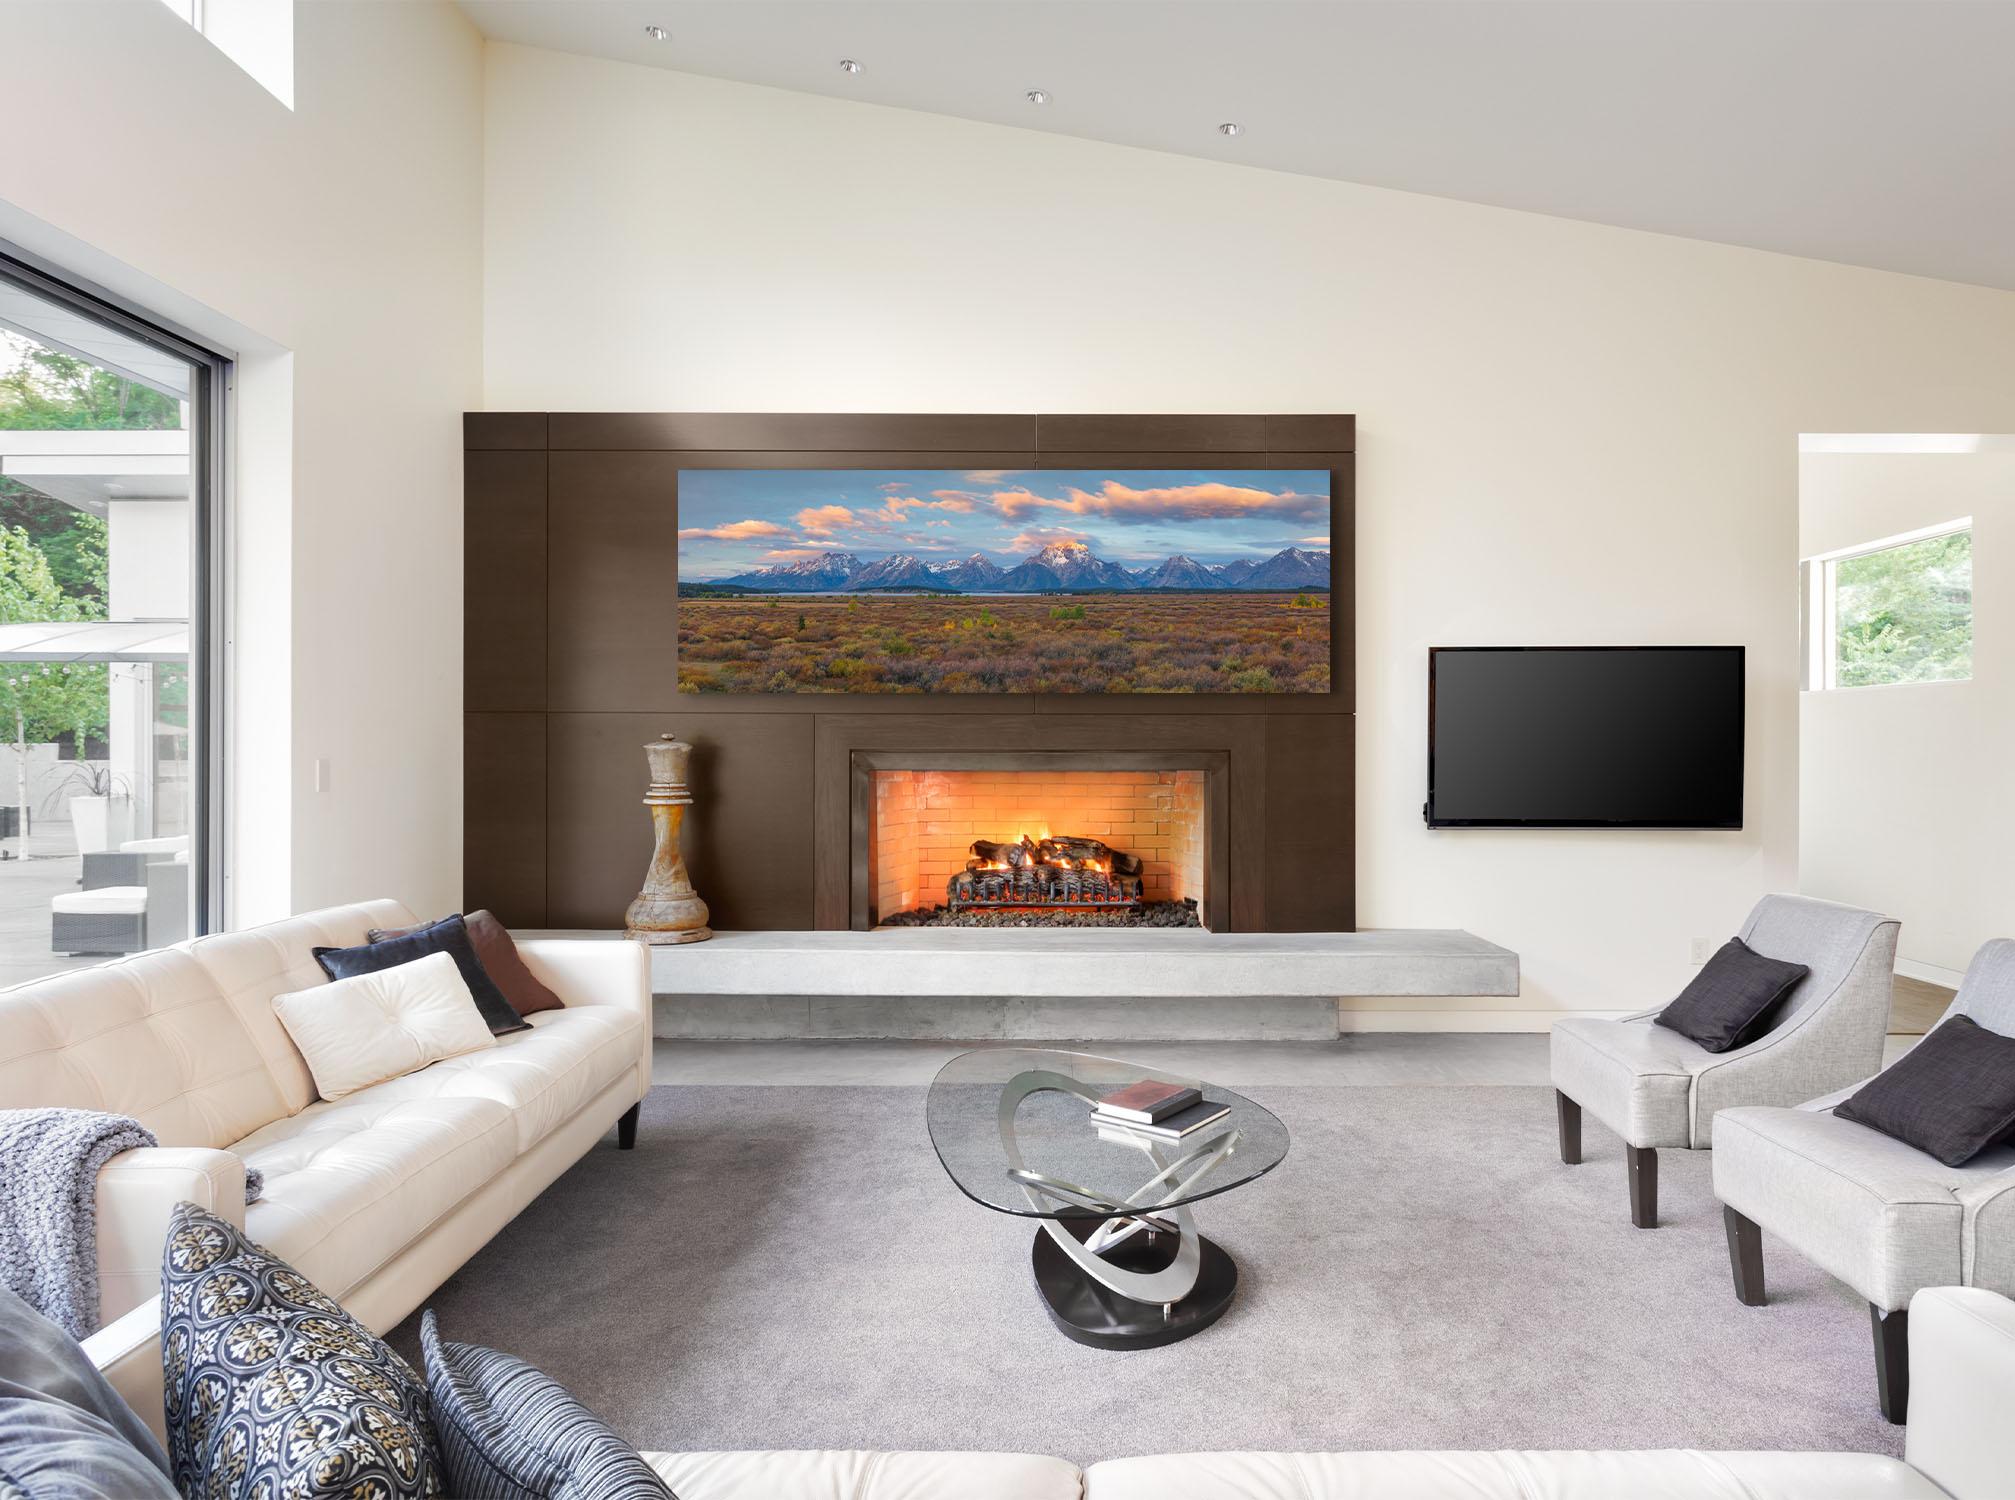 Spirit of the West Wyoming Teton Mountain Fine Art Print Luxury Artwork Home Decor Michael Andrejkow